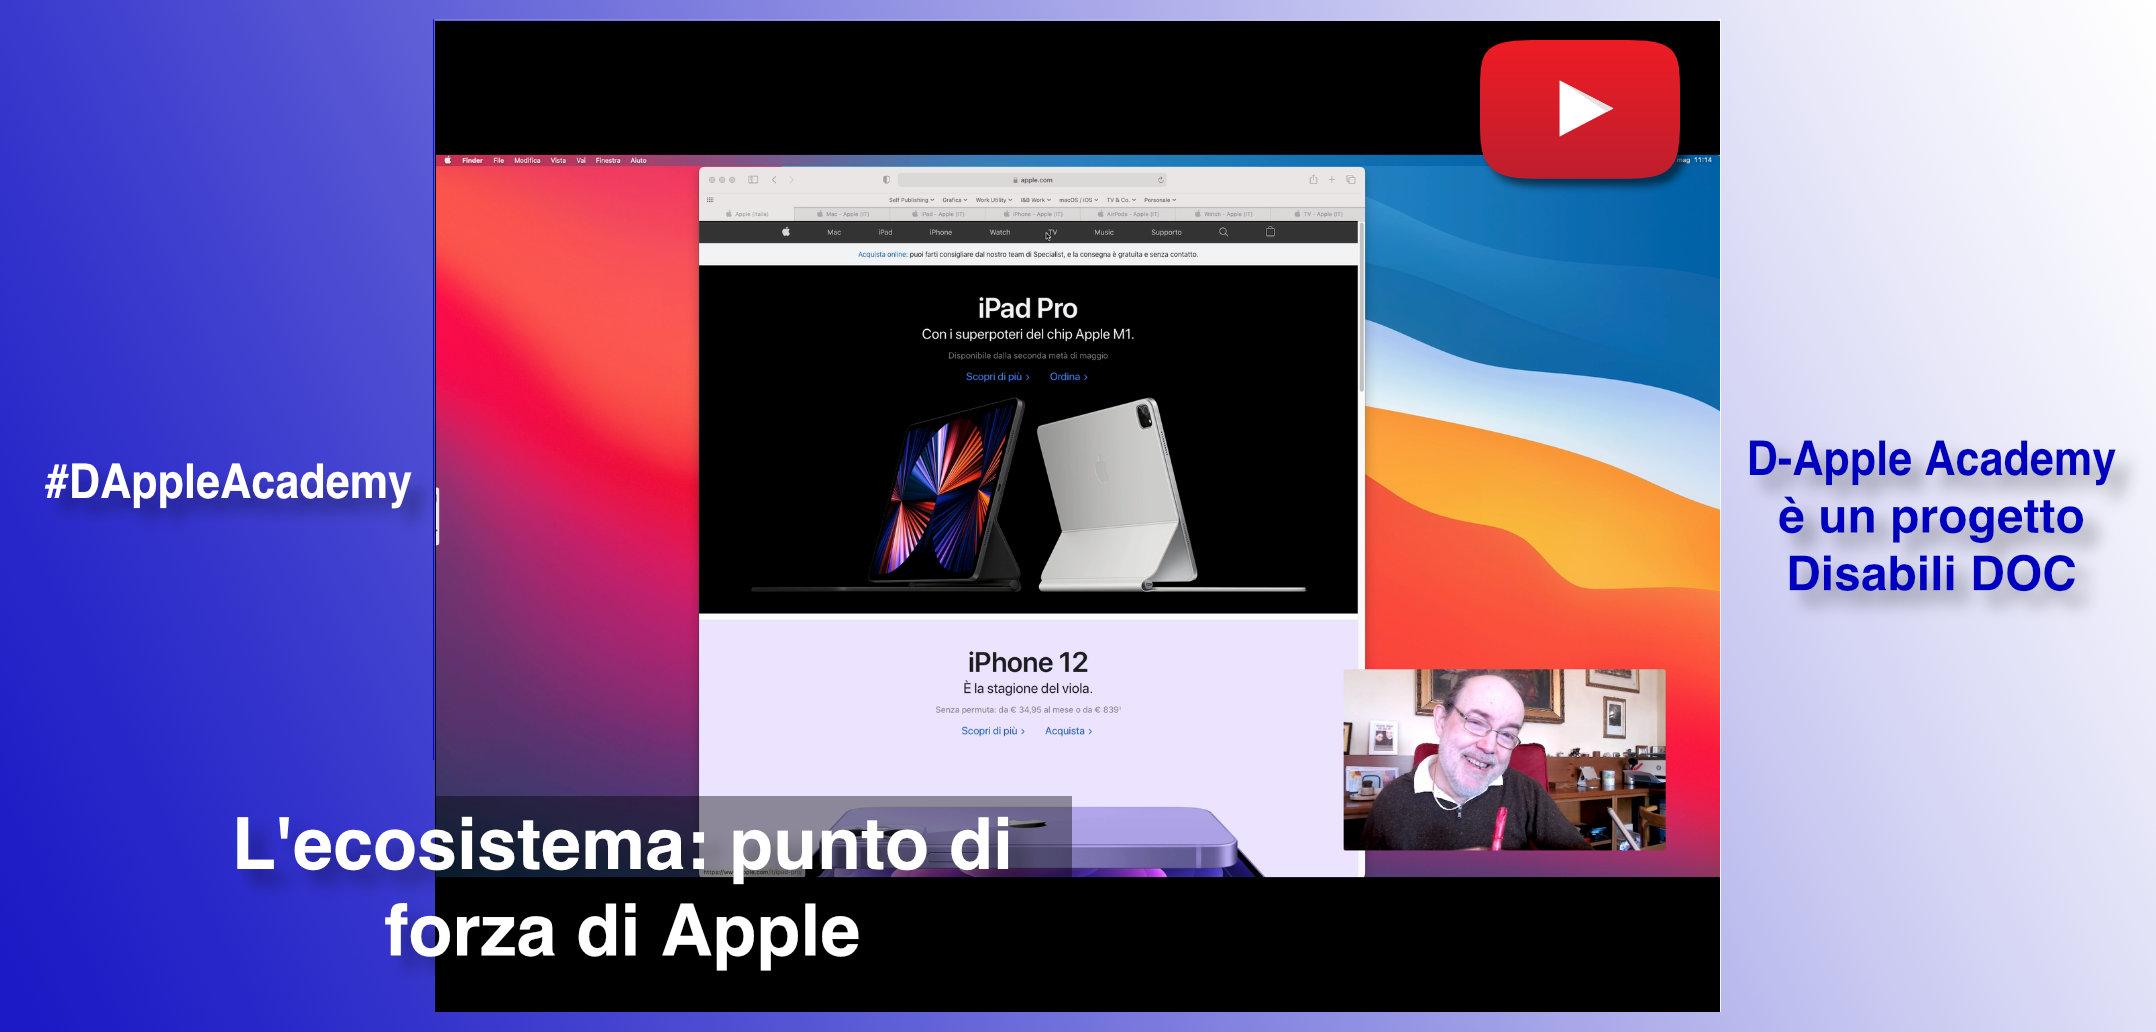 #DAppleAcademy / Parte 2ª / VIDEO / Perché i Disabili dovrebbero scegliere Apple?